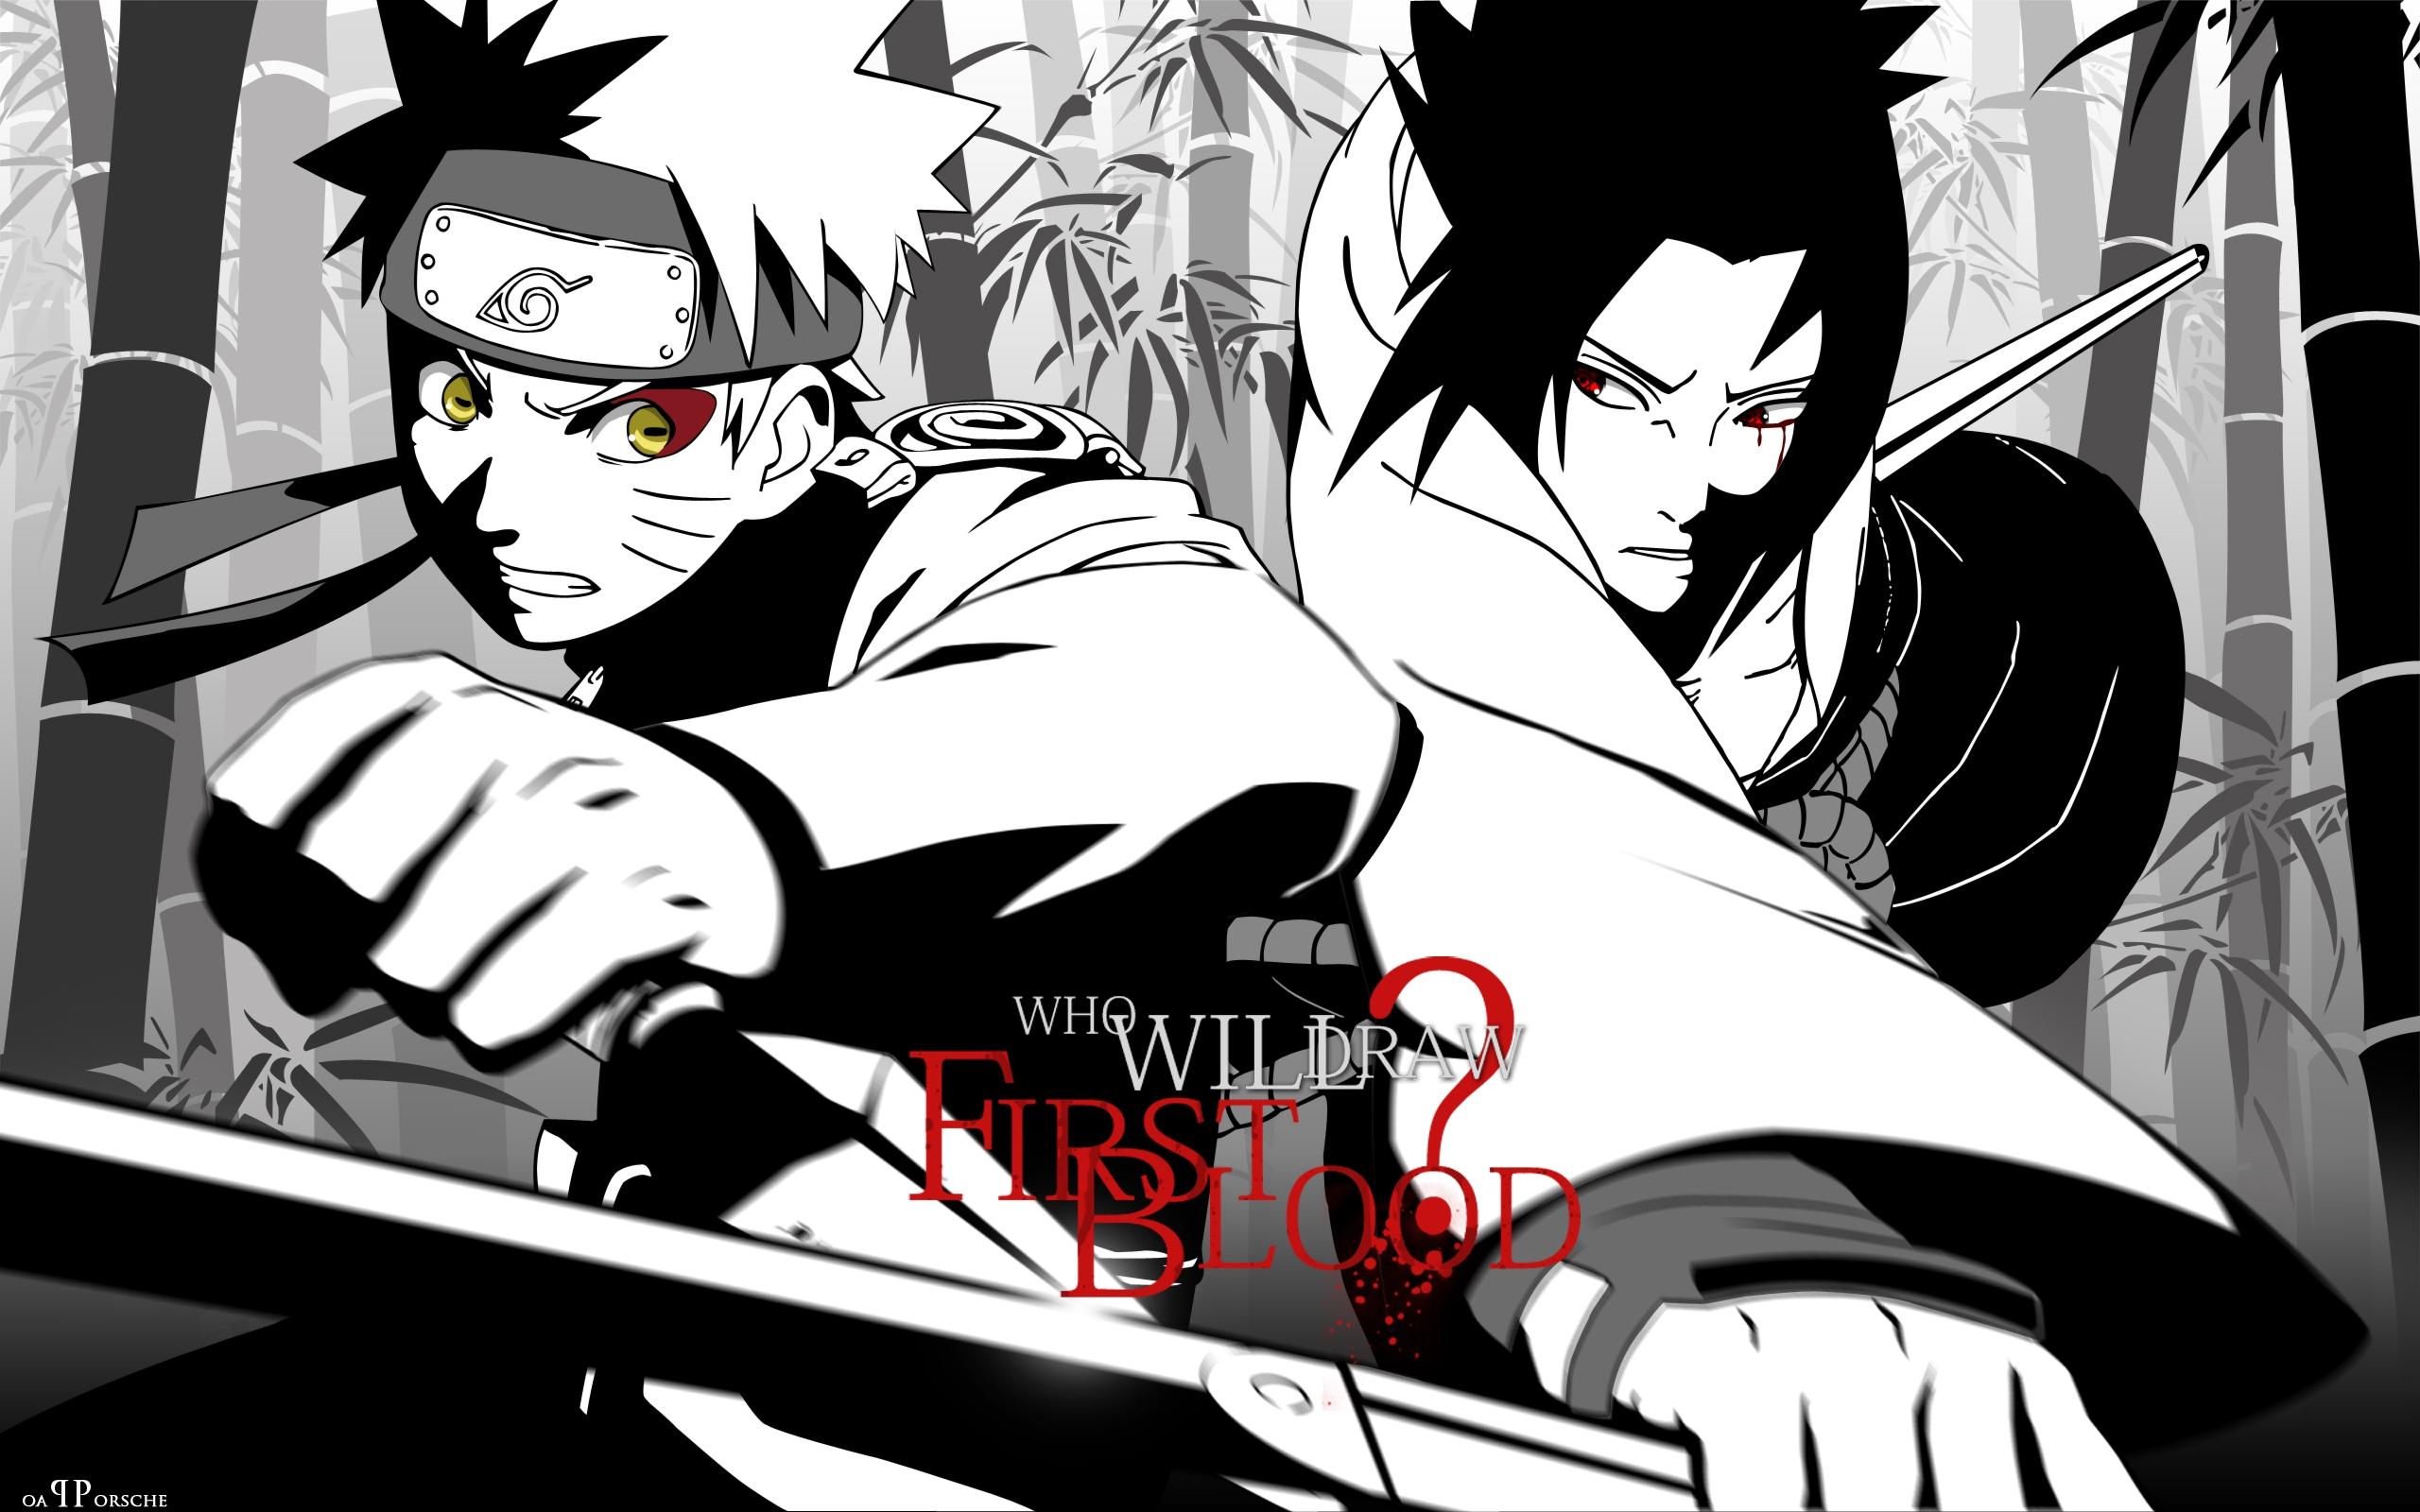 Wallpaper Illustration Anime Battle Cartoon Guys Posture